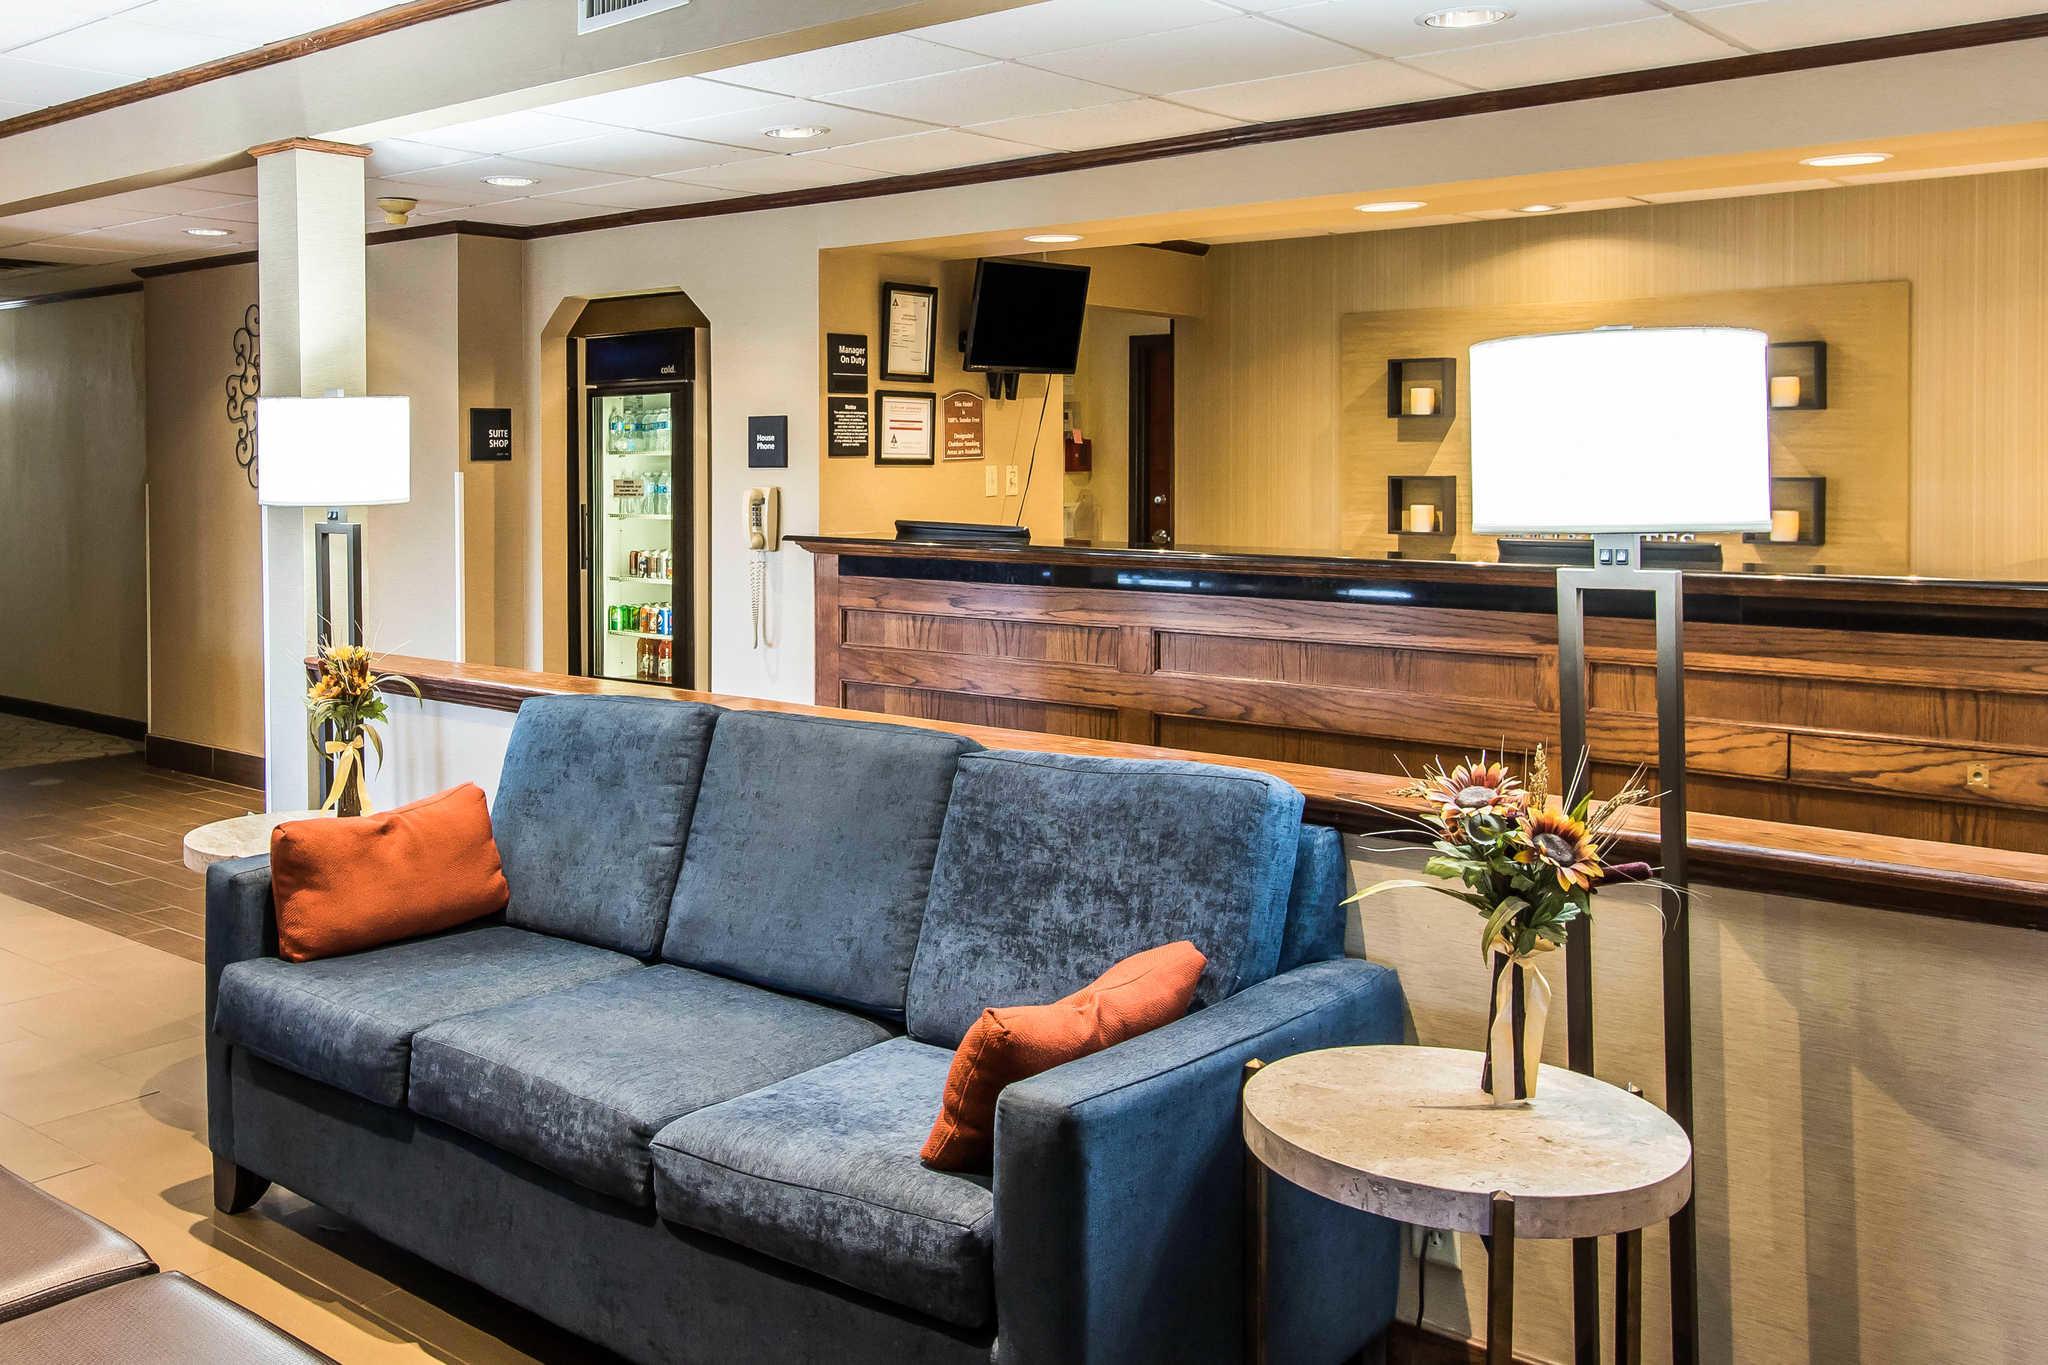 Comfort Inn & Suites Ardmore image 5